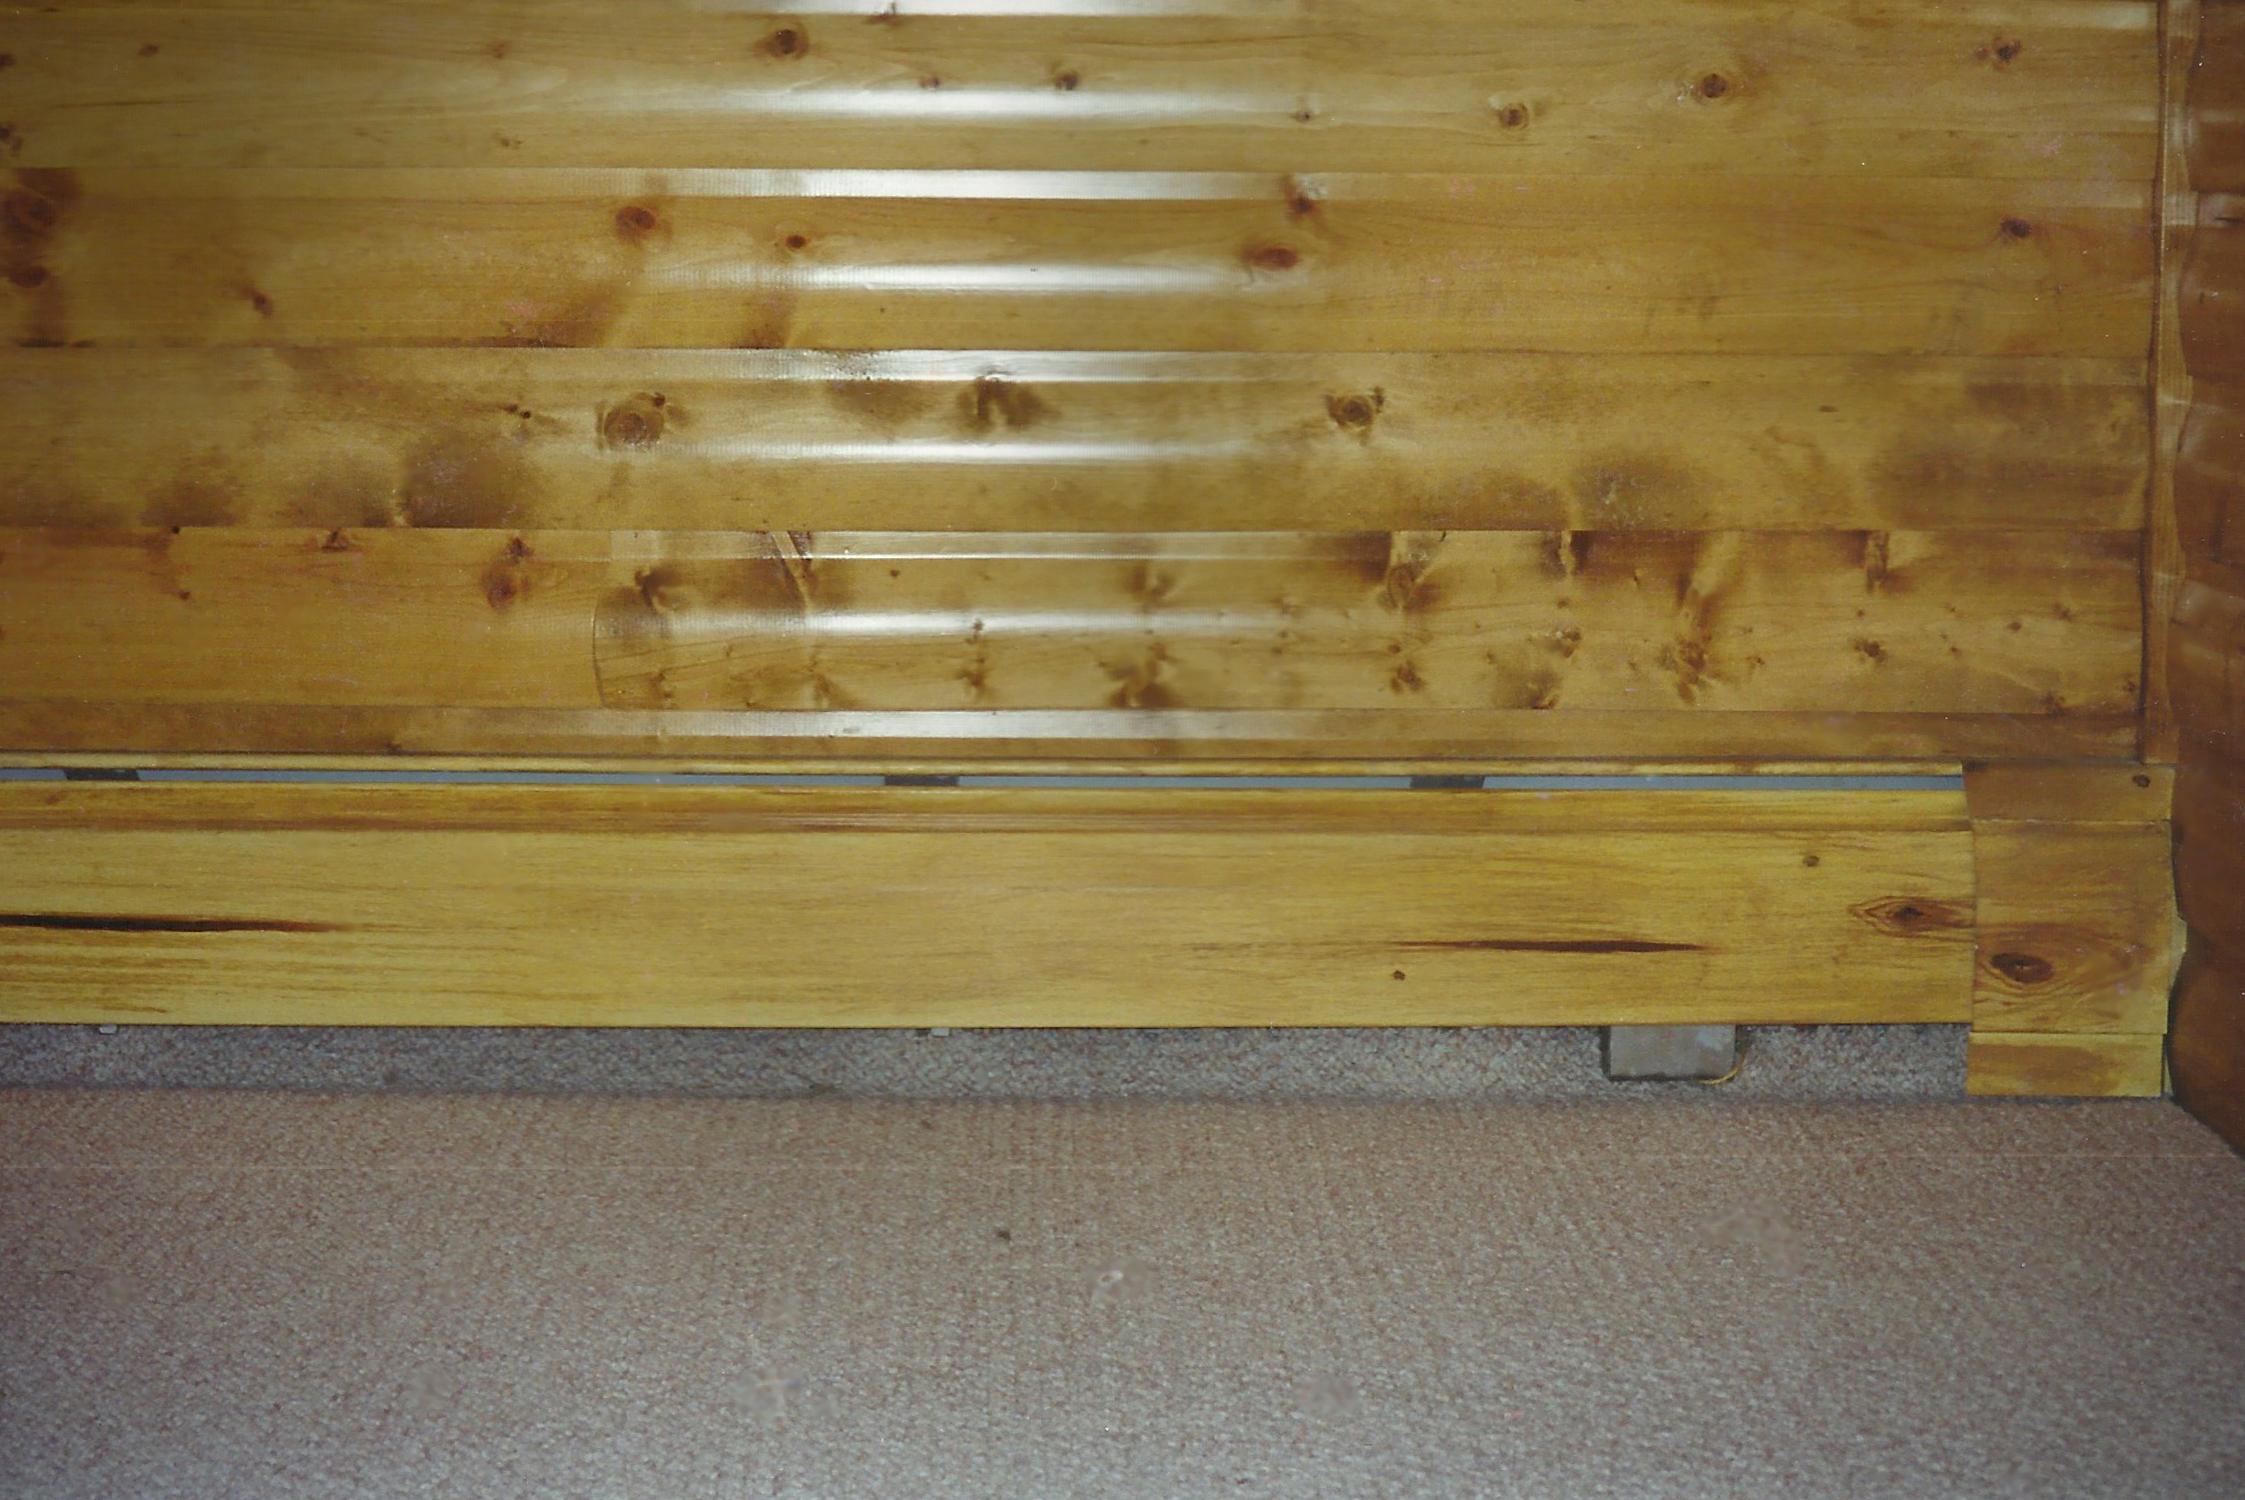 Wood-grain heater